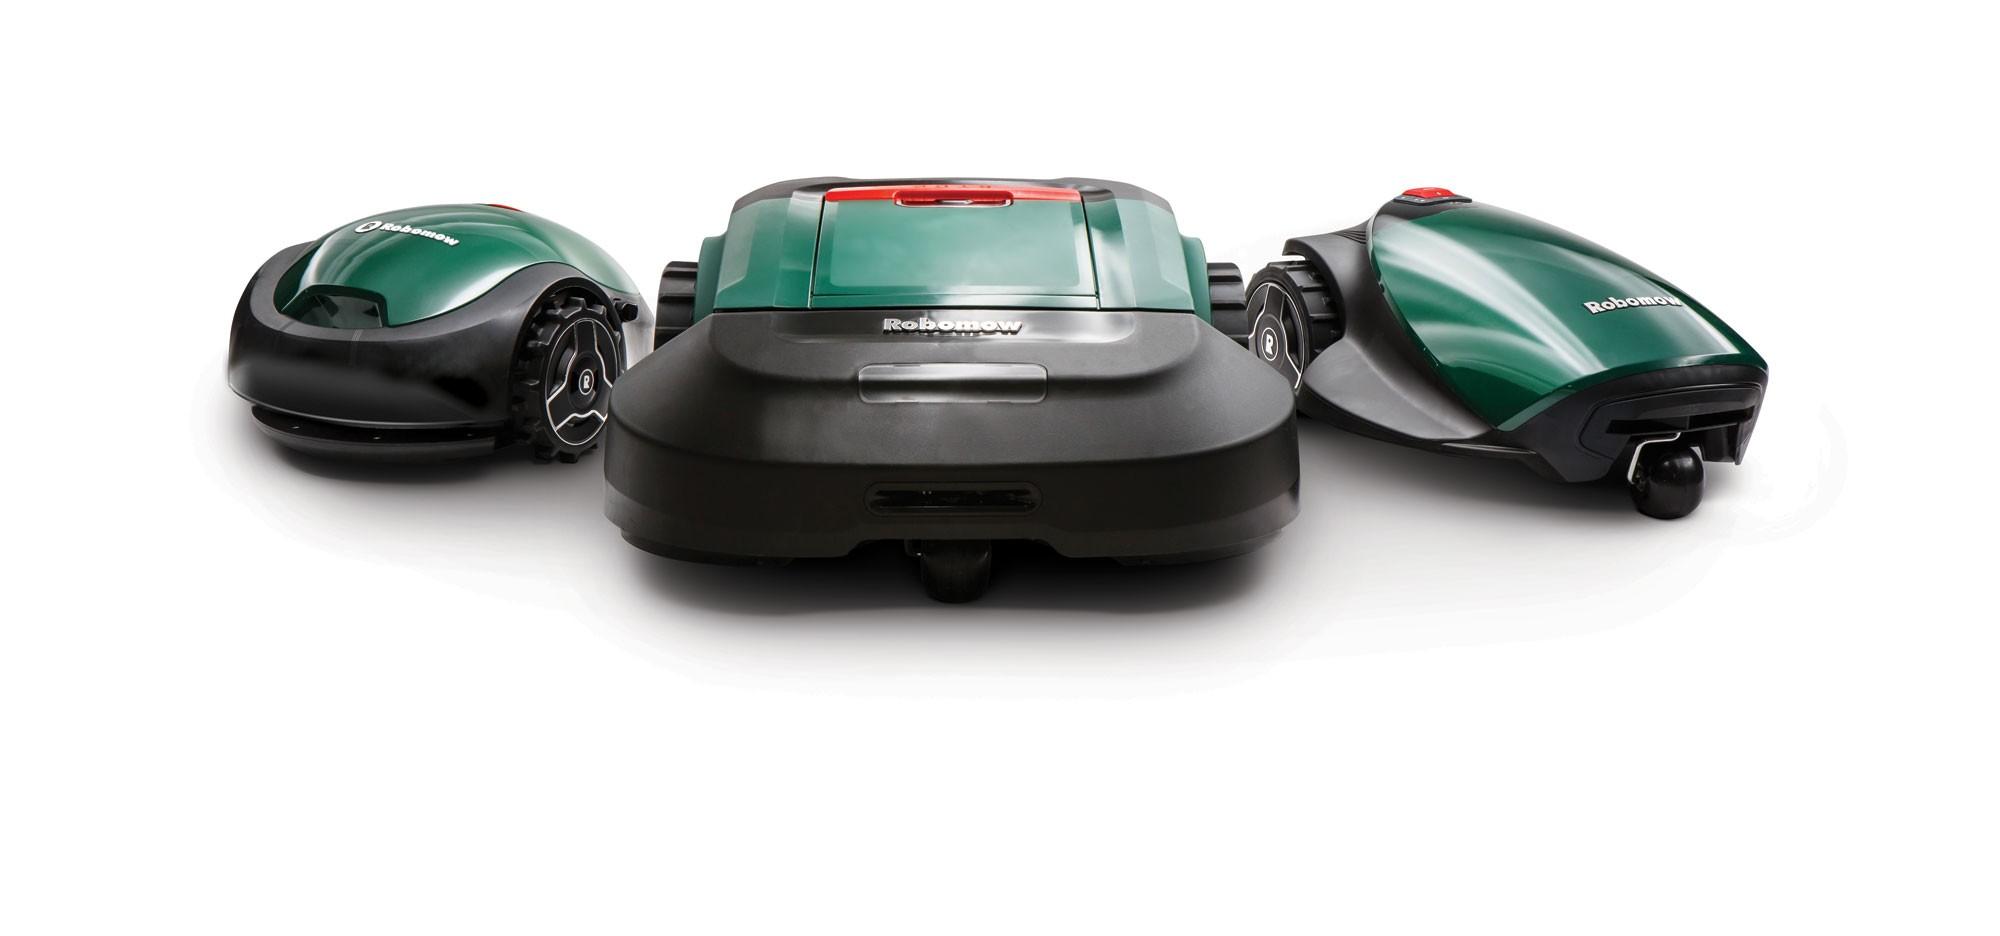 Robomow Mähroboter / Rasenroboter RC Stylish 308u SB 28cm Bild 2